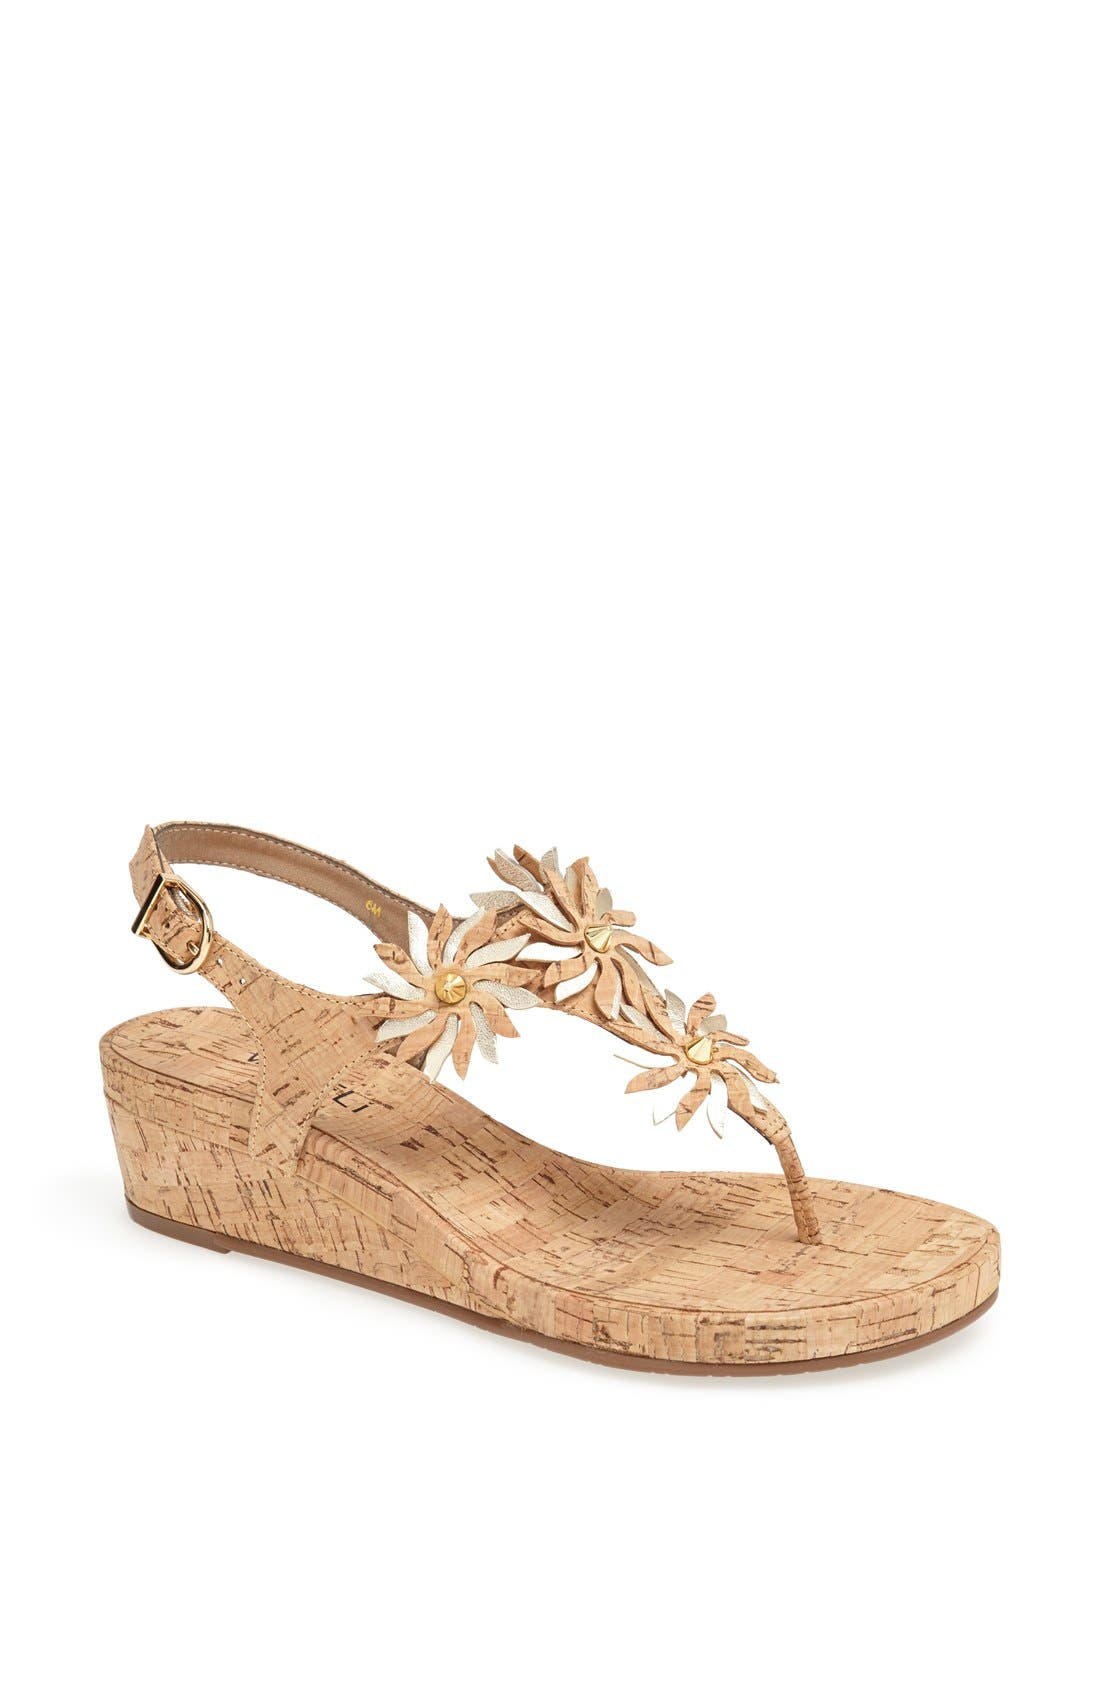 Alternate Image 1 Selected - VANELi 'Kenan' Wedge Thong Sandal